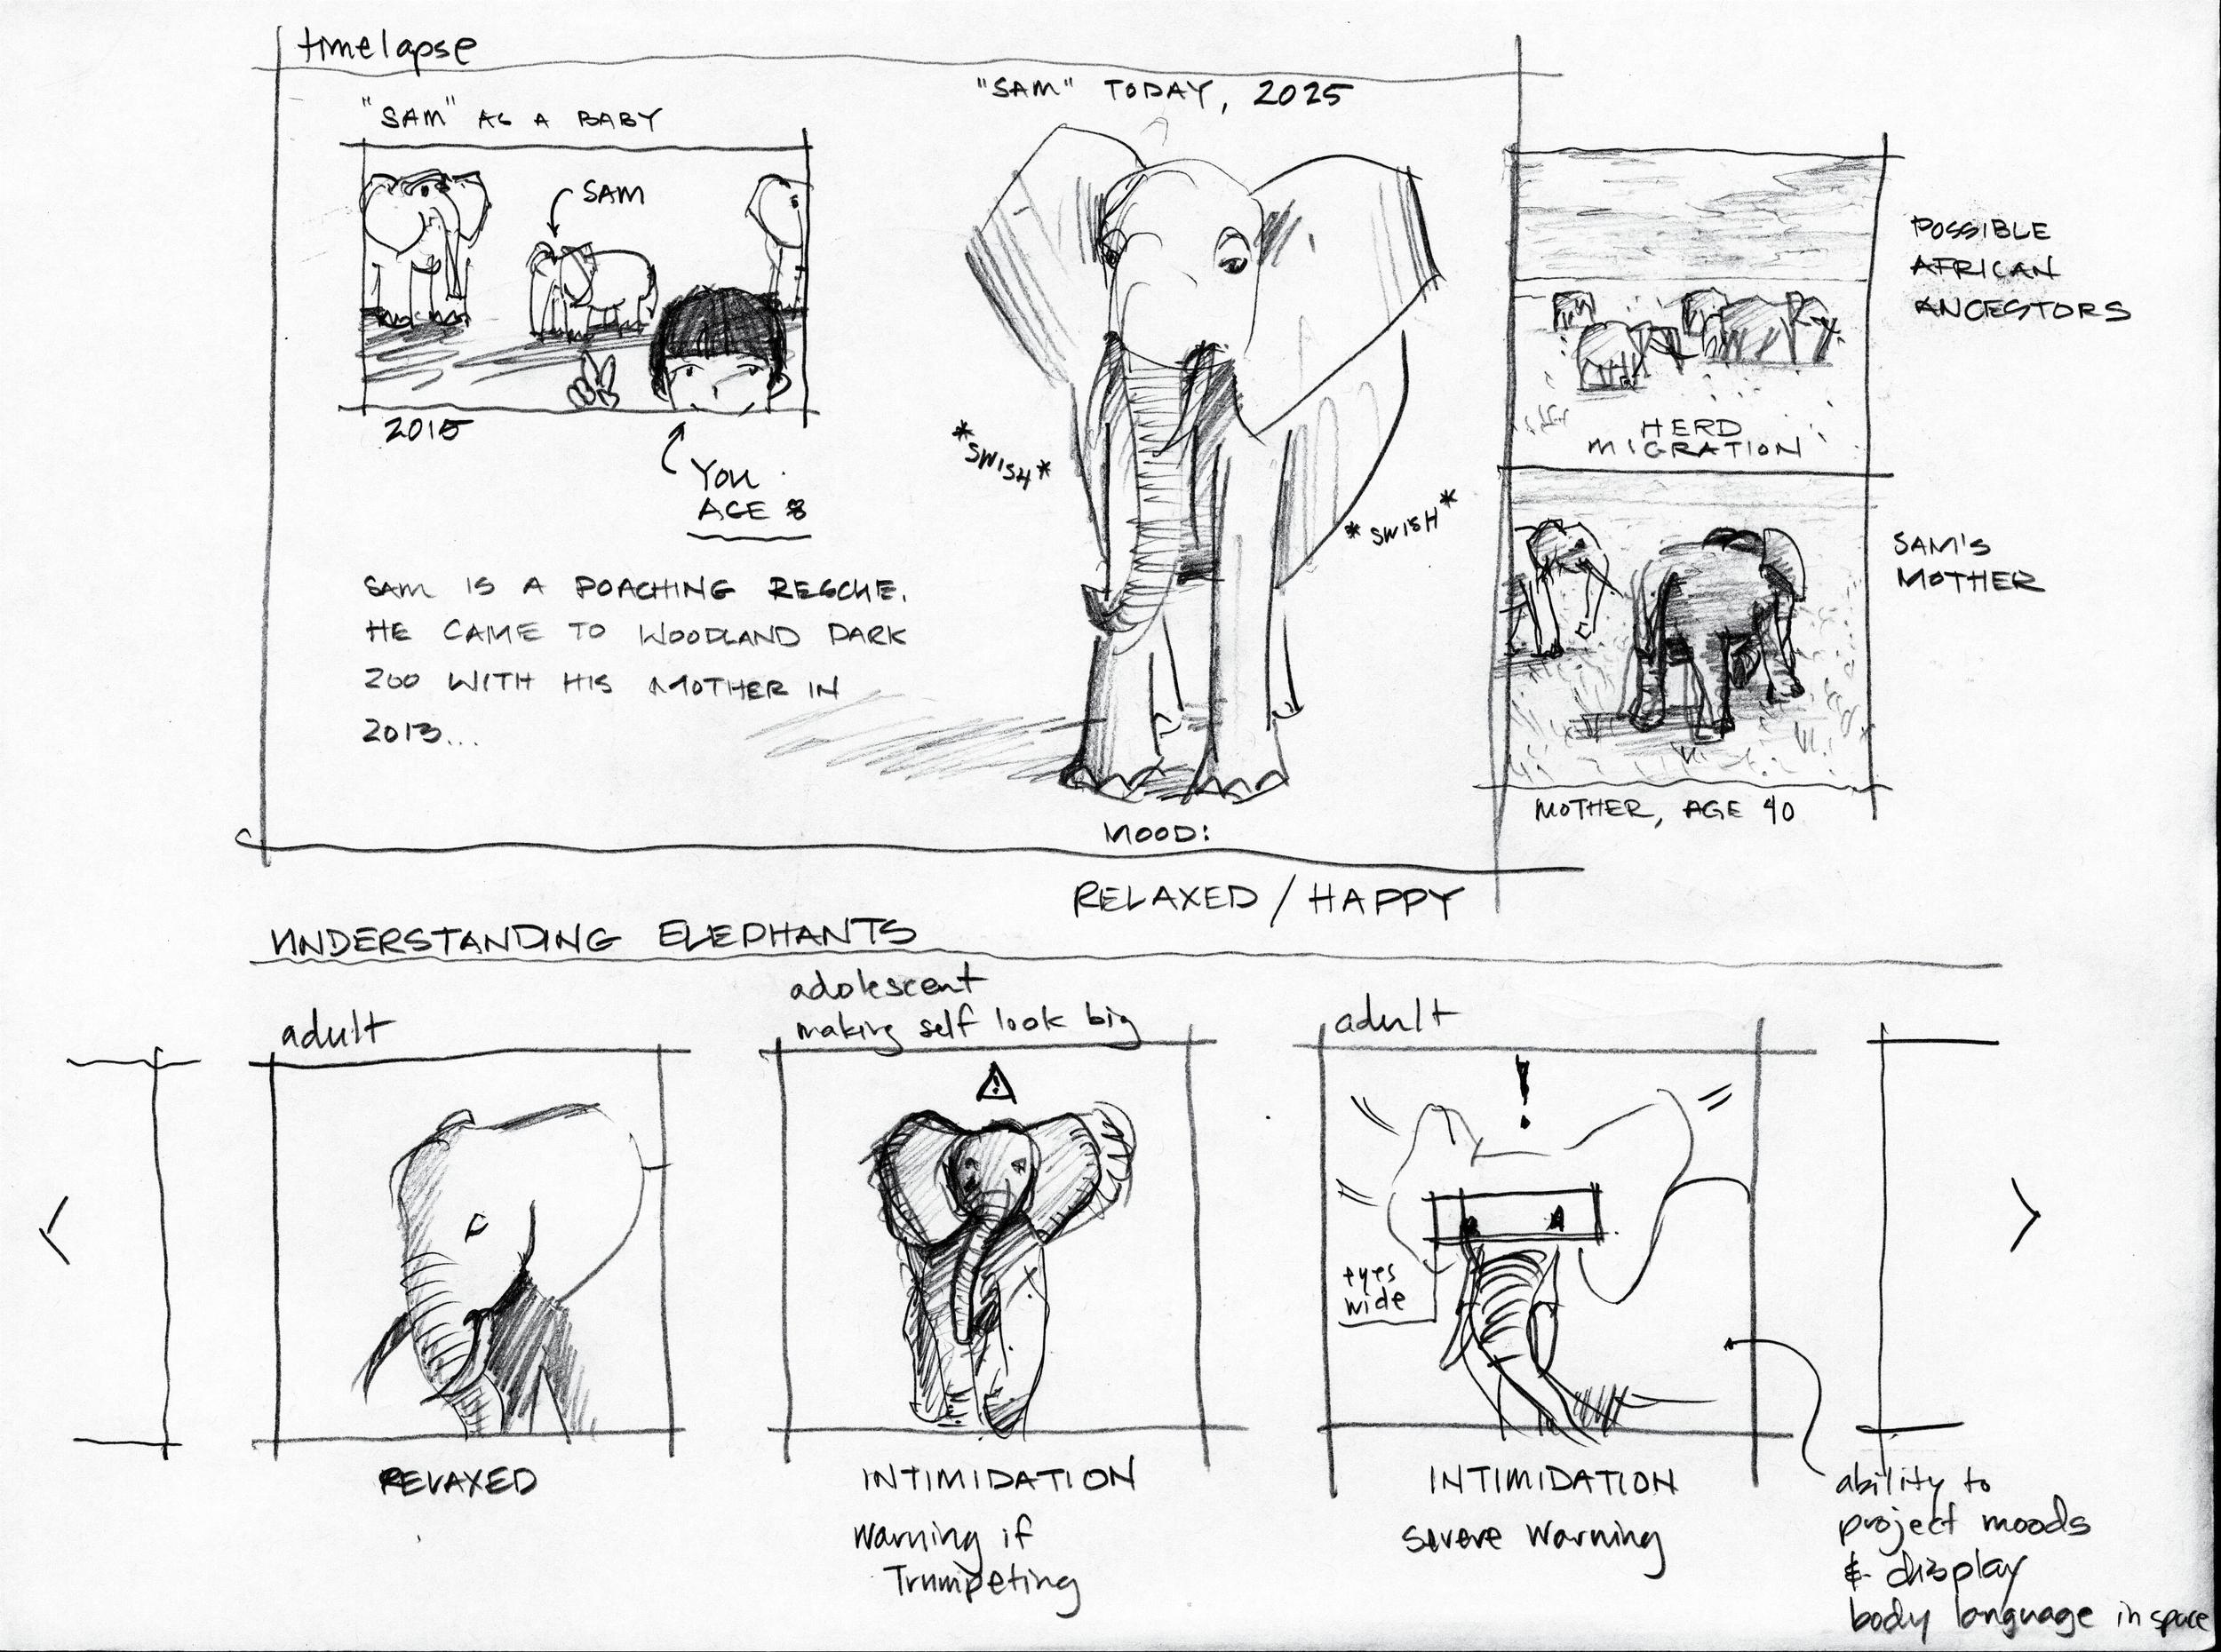 ElephantStory.png